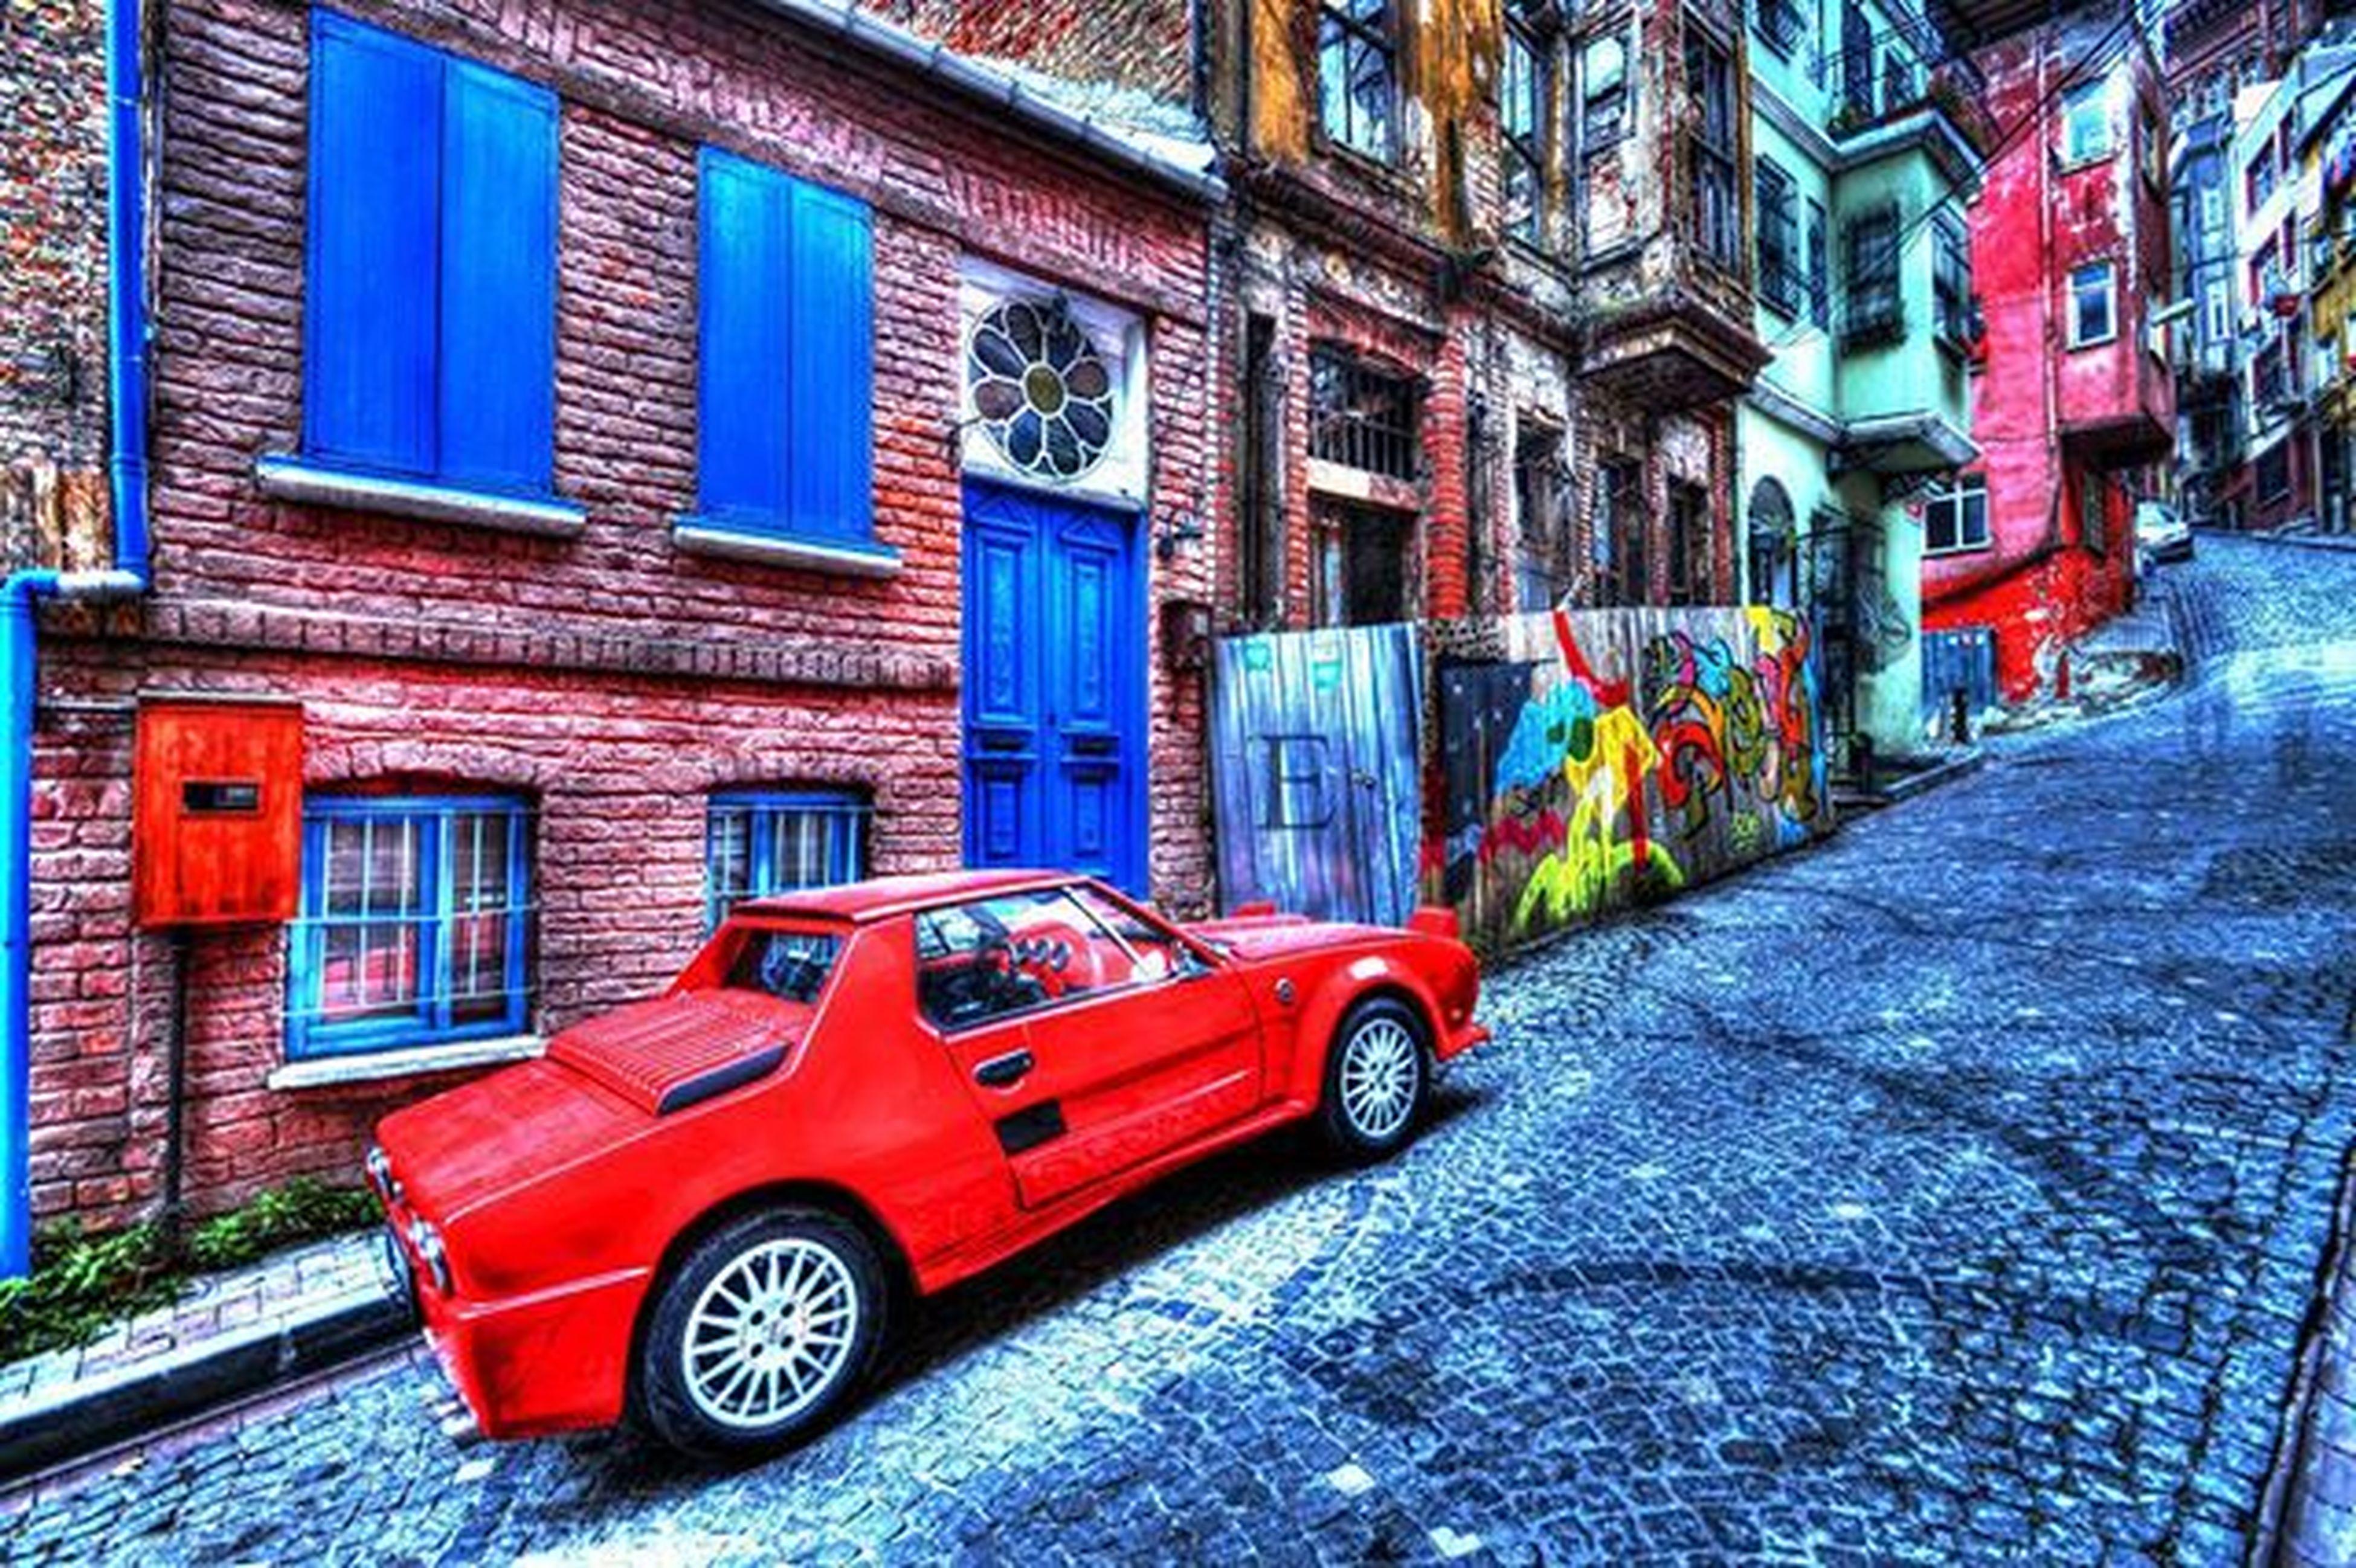 Fener Balat Fiat Classic Pininfarina Car HDR HighDynamicRange Special 12poses Nofilter Photomatix Colors Nikon DSLR Camera Photography Emrahnihaterel